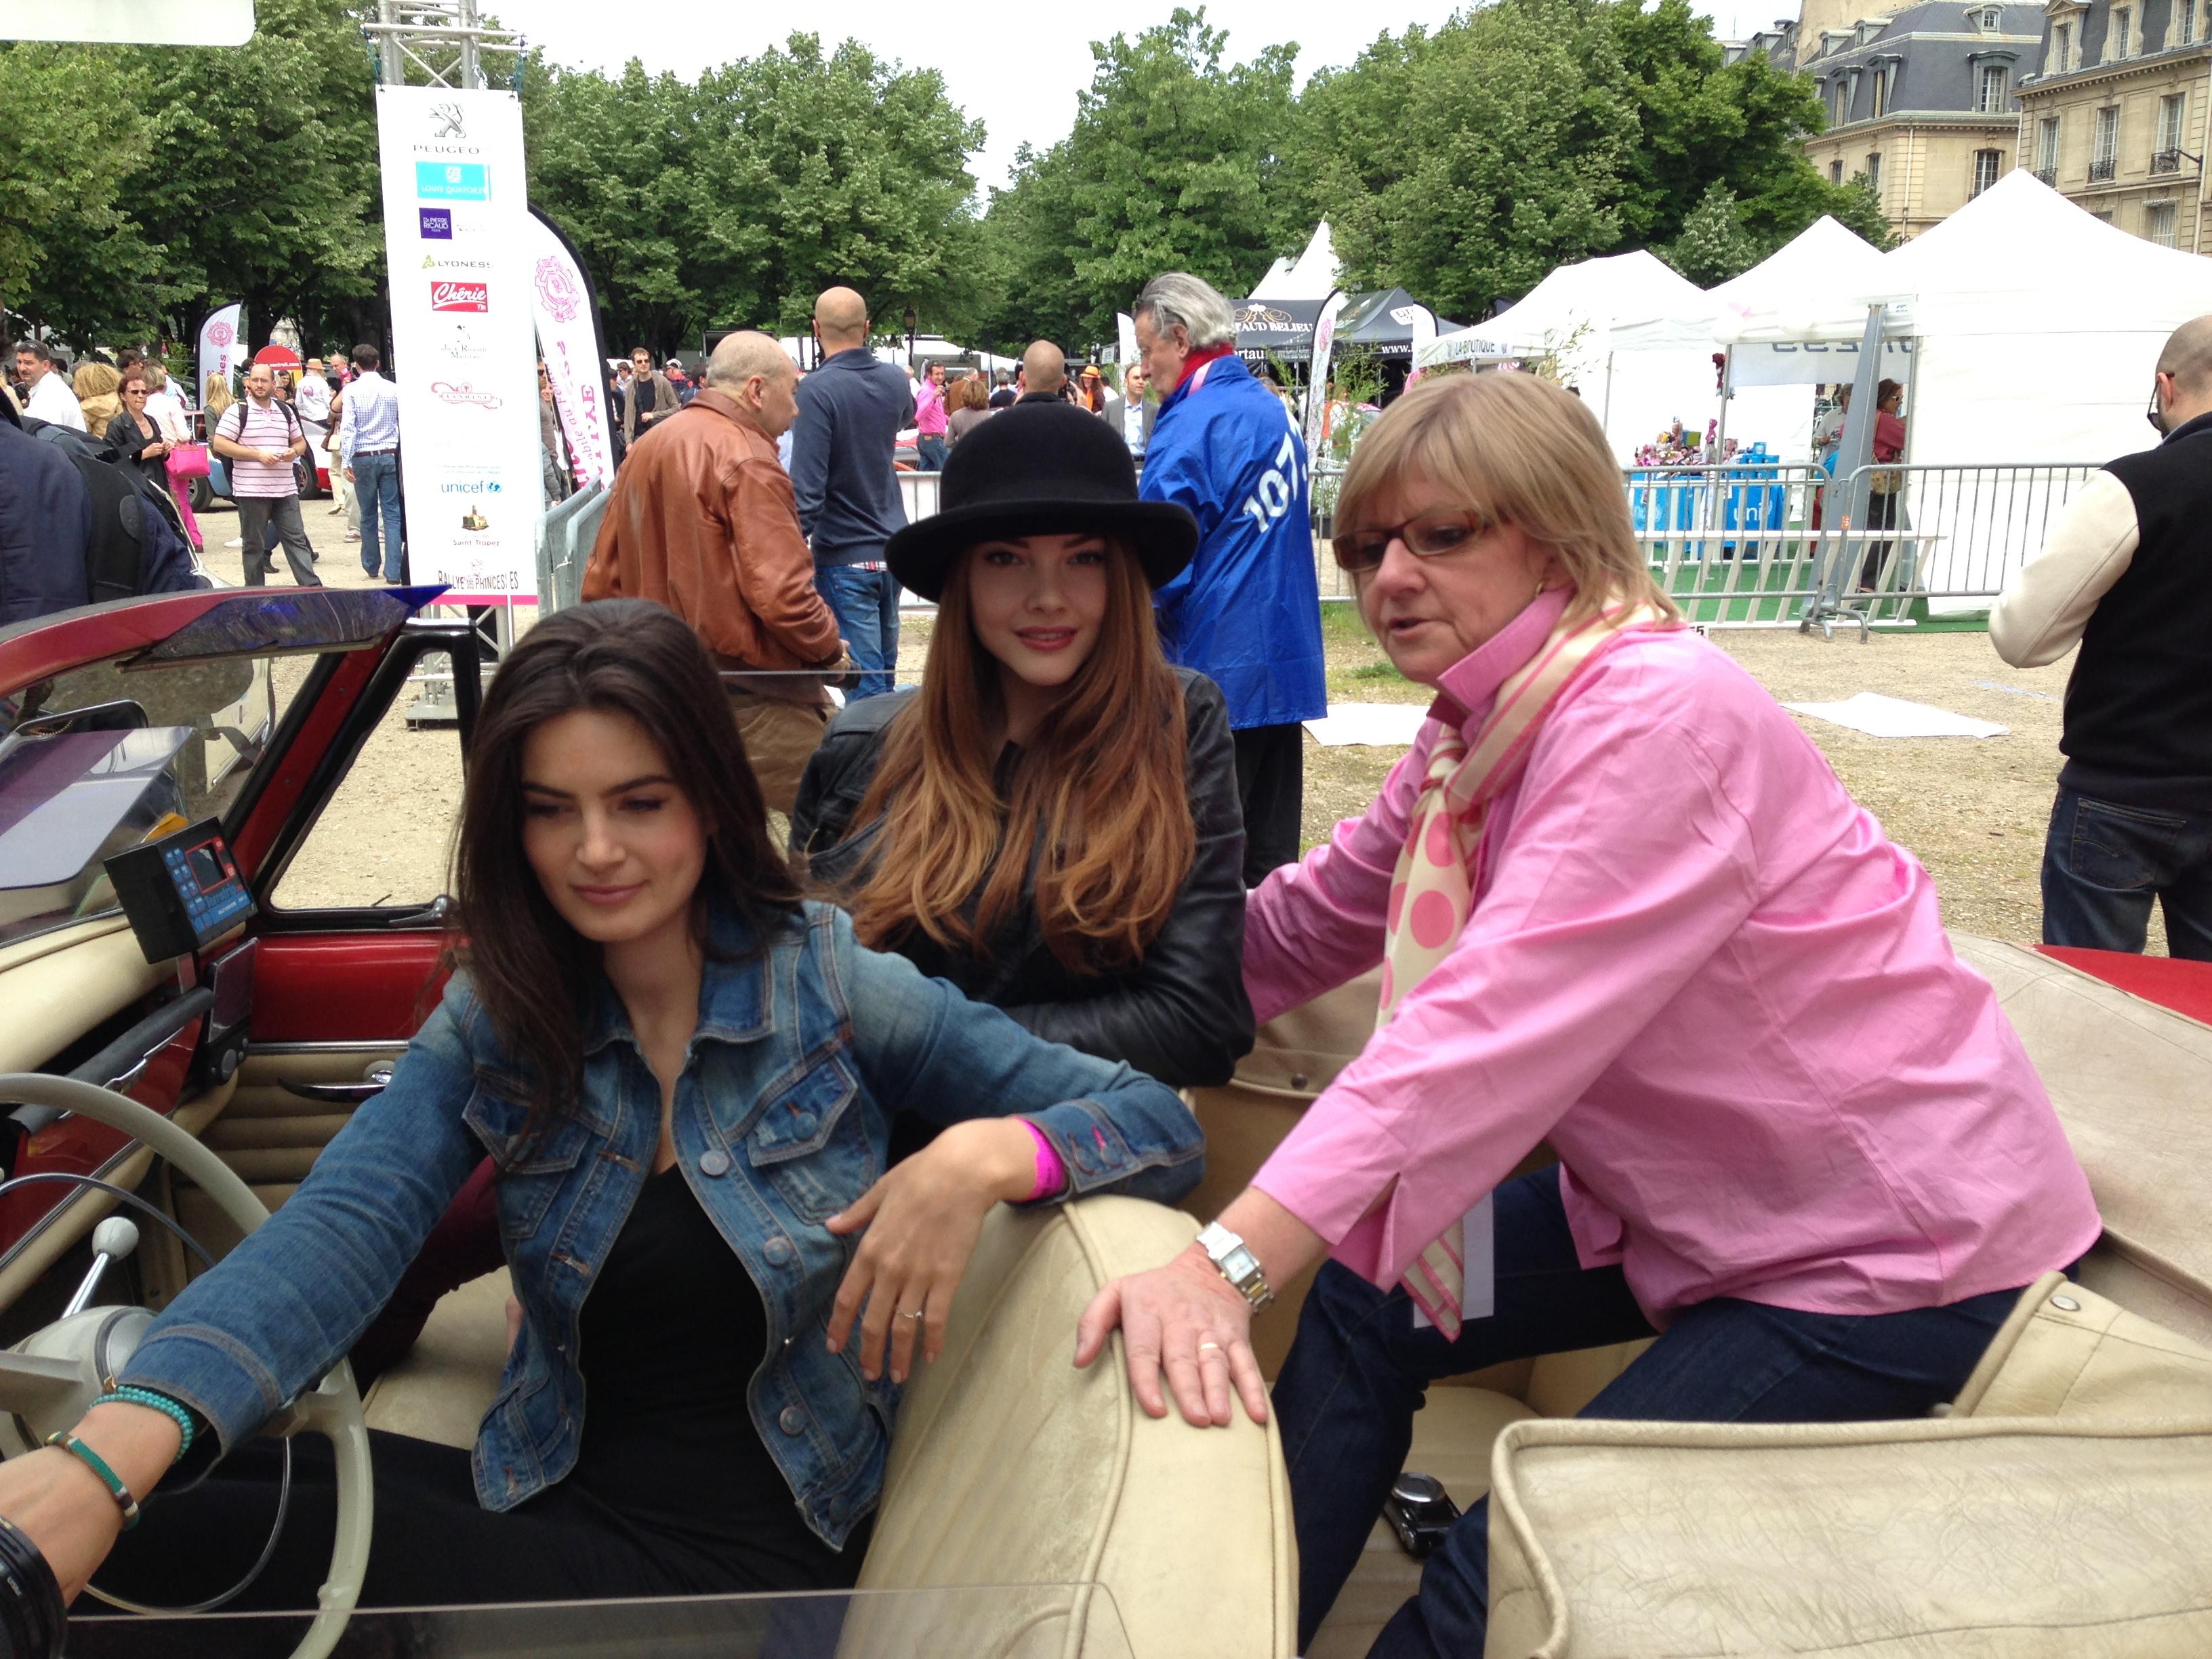 rallye des princesses, rallye des princesses 2013, viviane zaniroli, solweig lizlow, lara micheli, rallye, paris, invalides, voiture collections